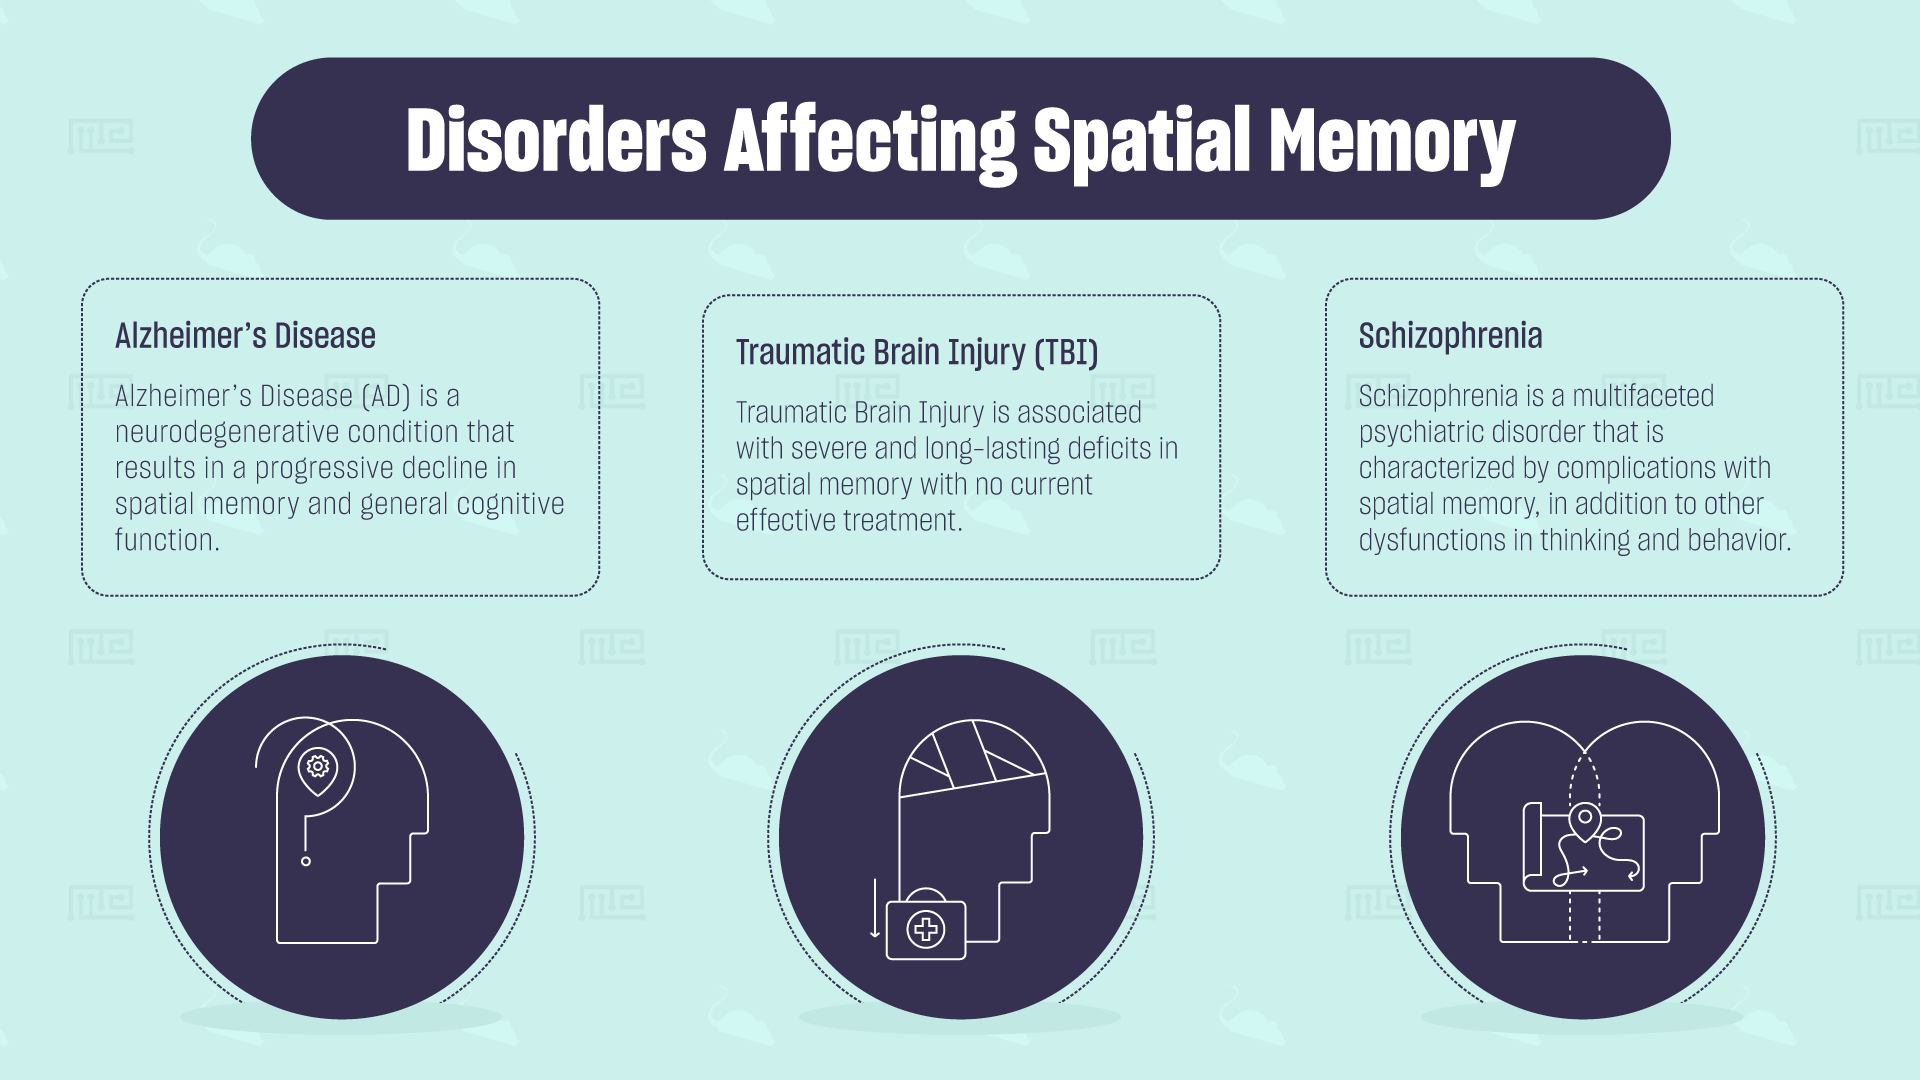 Disorders Affecting Spatial Memory